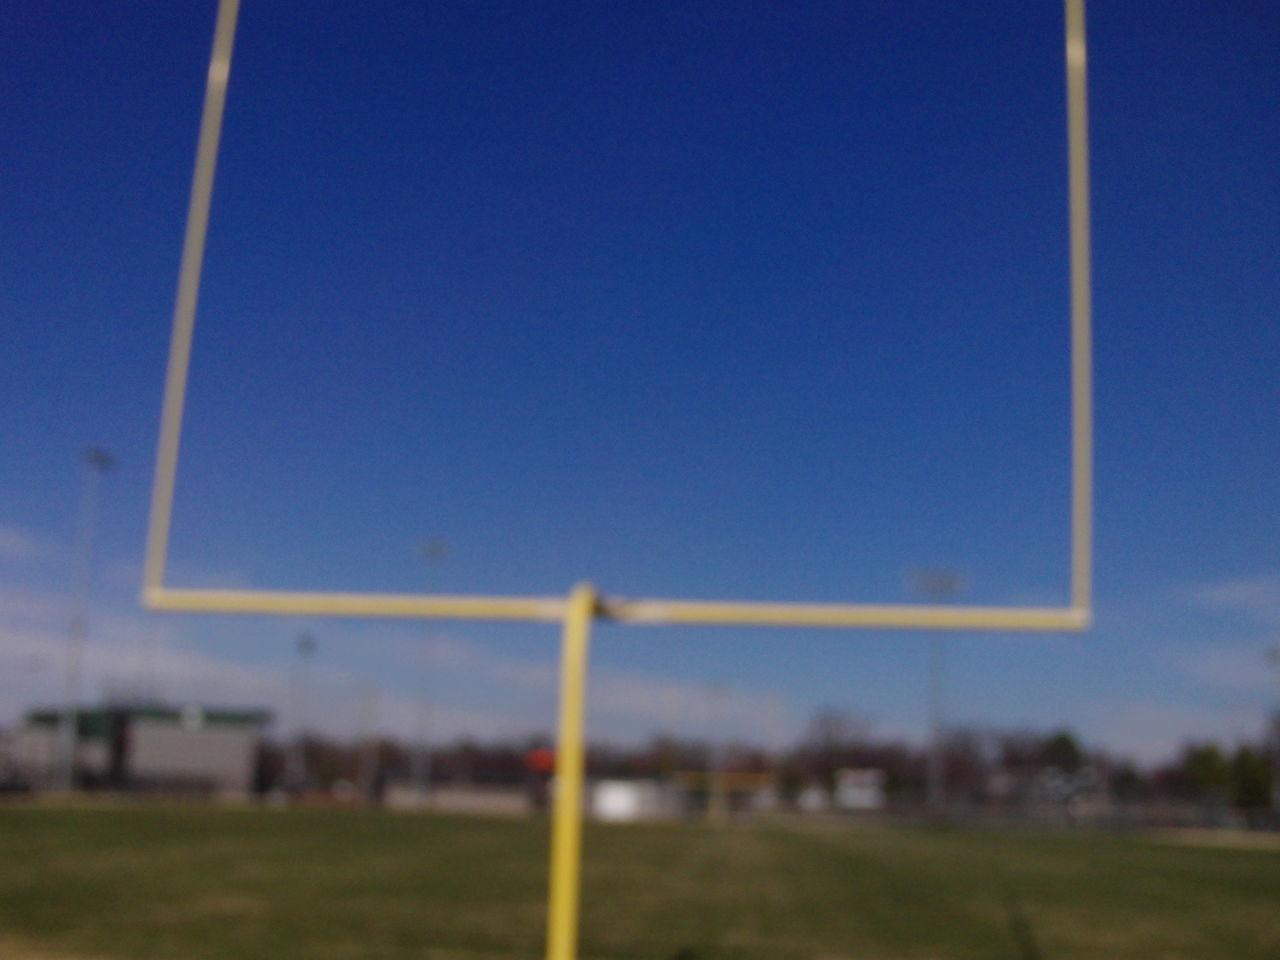 Arkansas Atmosphere Blue Clear Sky Fieldgoal Post Football Green Mid-air